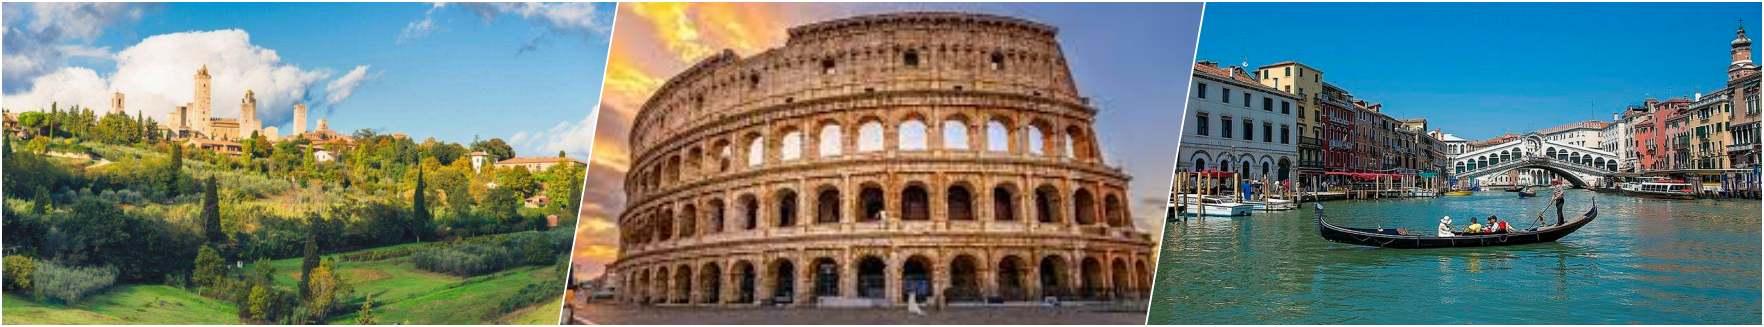 Siena-Rome-Venice